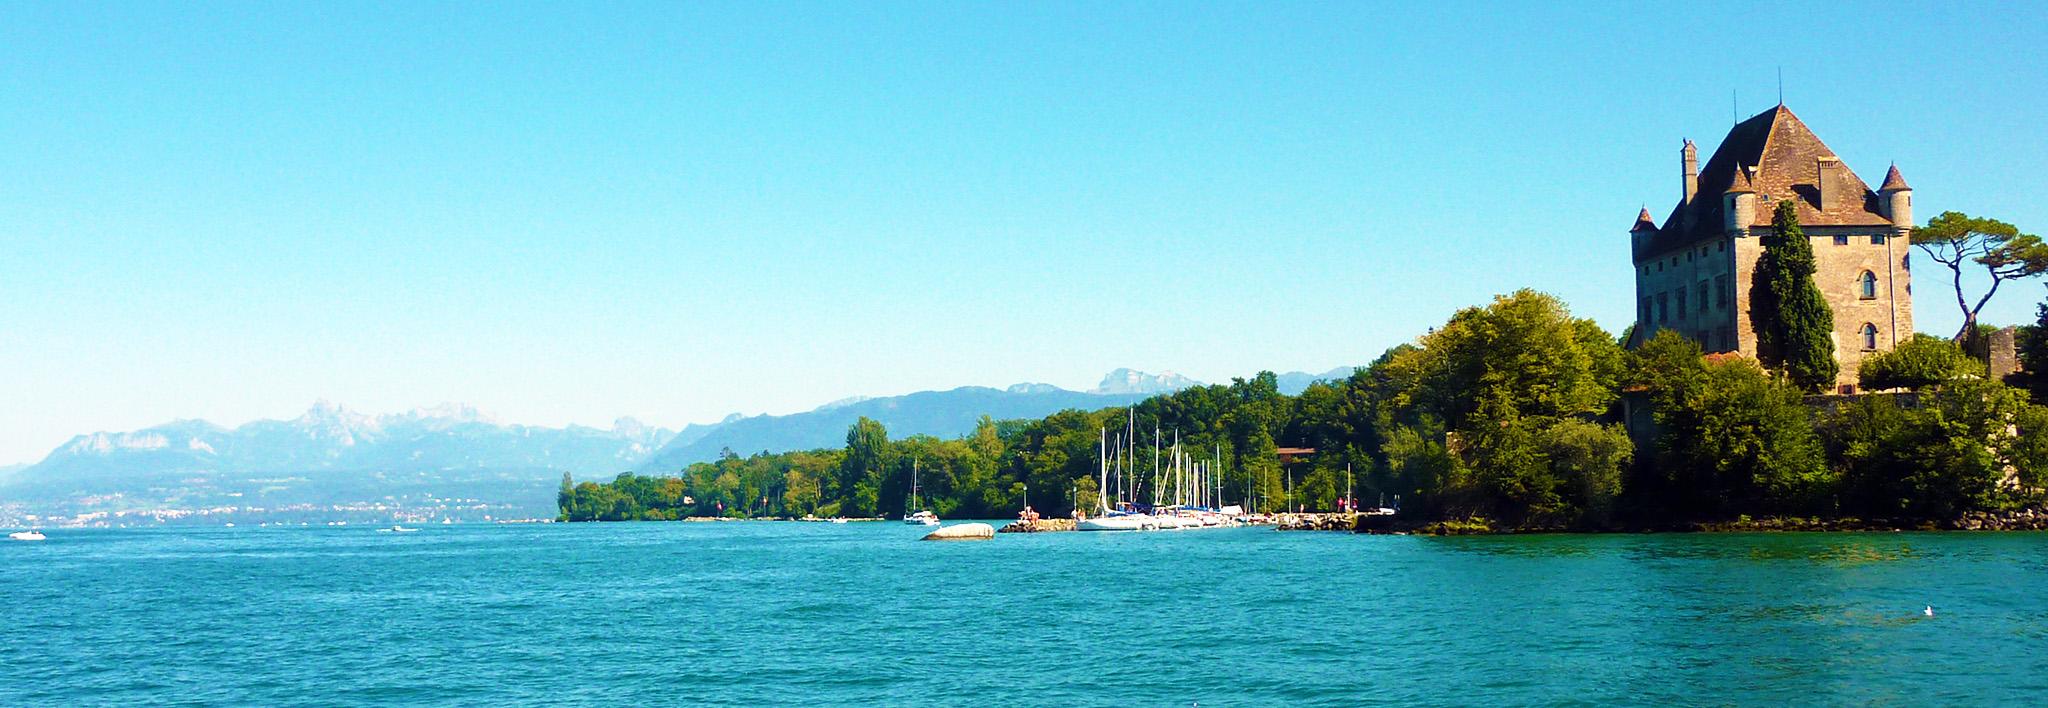 kt_2020_380_Keytours_excursions_Swisstours_yvoire_chateau2_2048_10